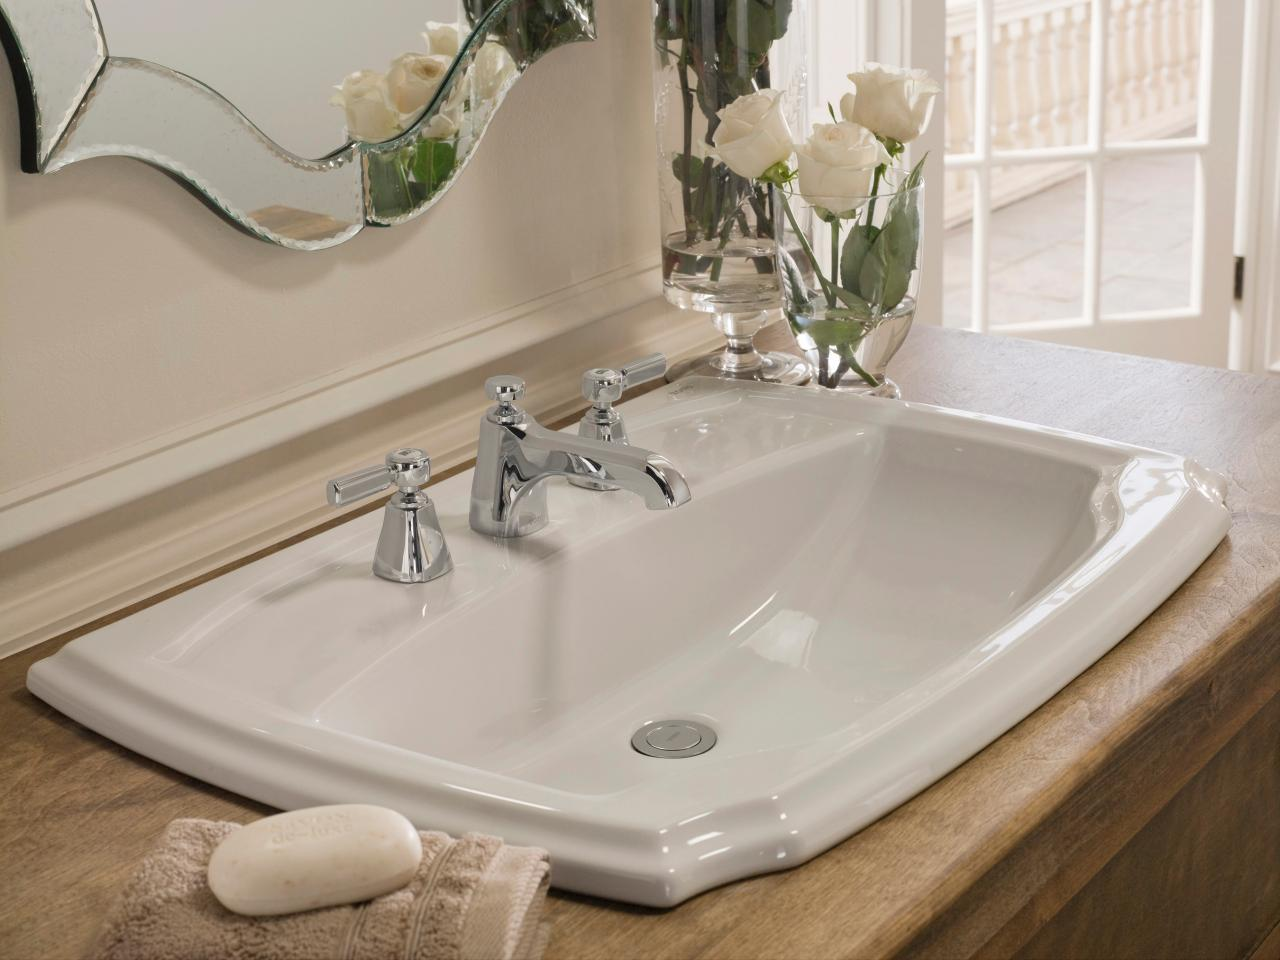 Bathroom faucet reviews